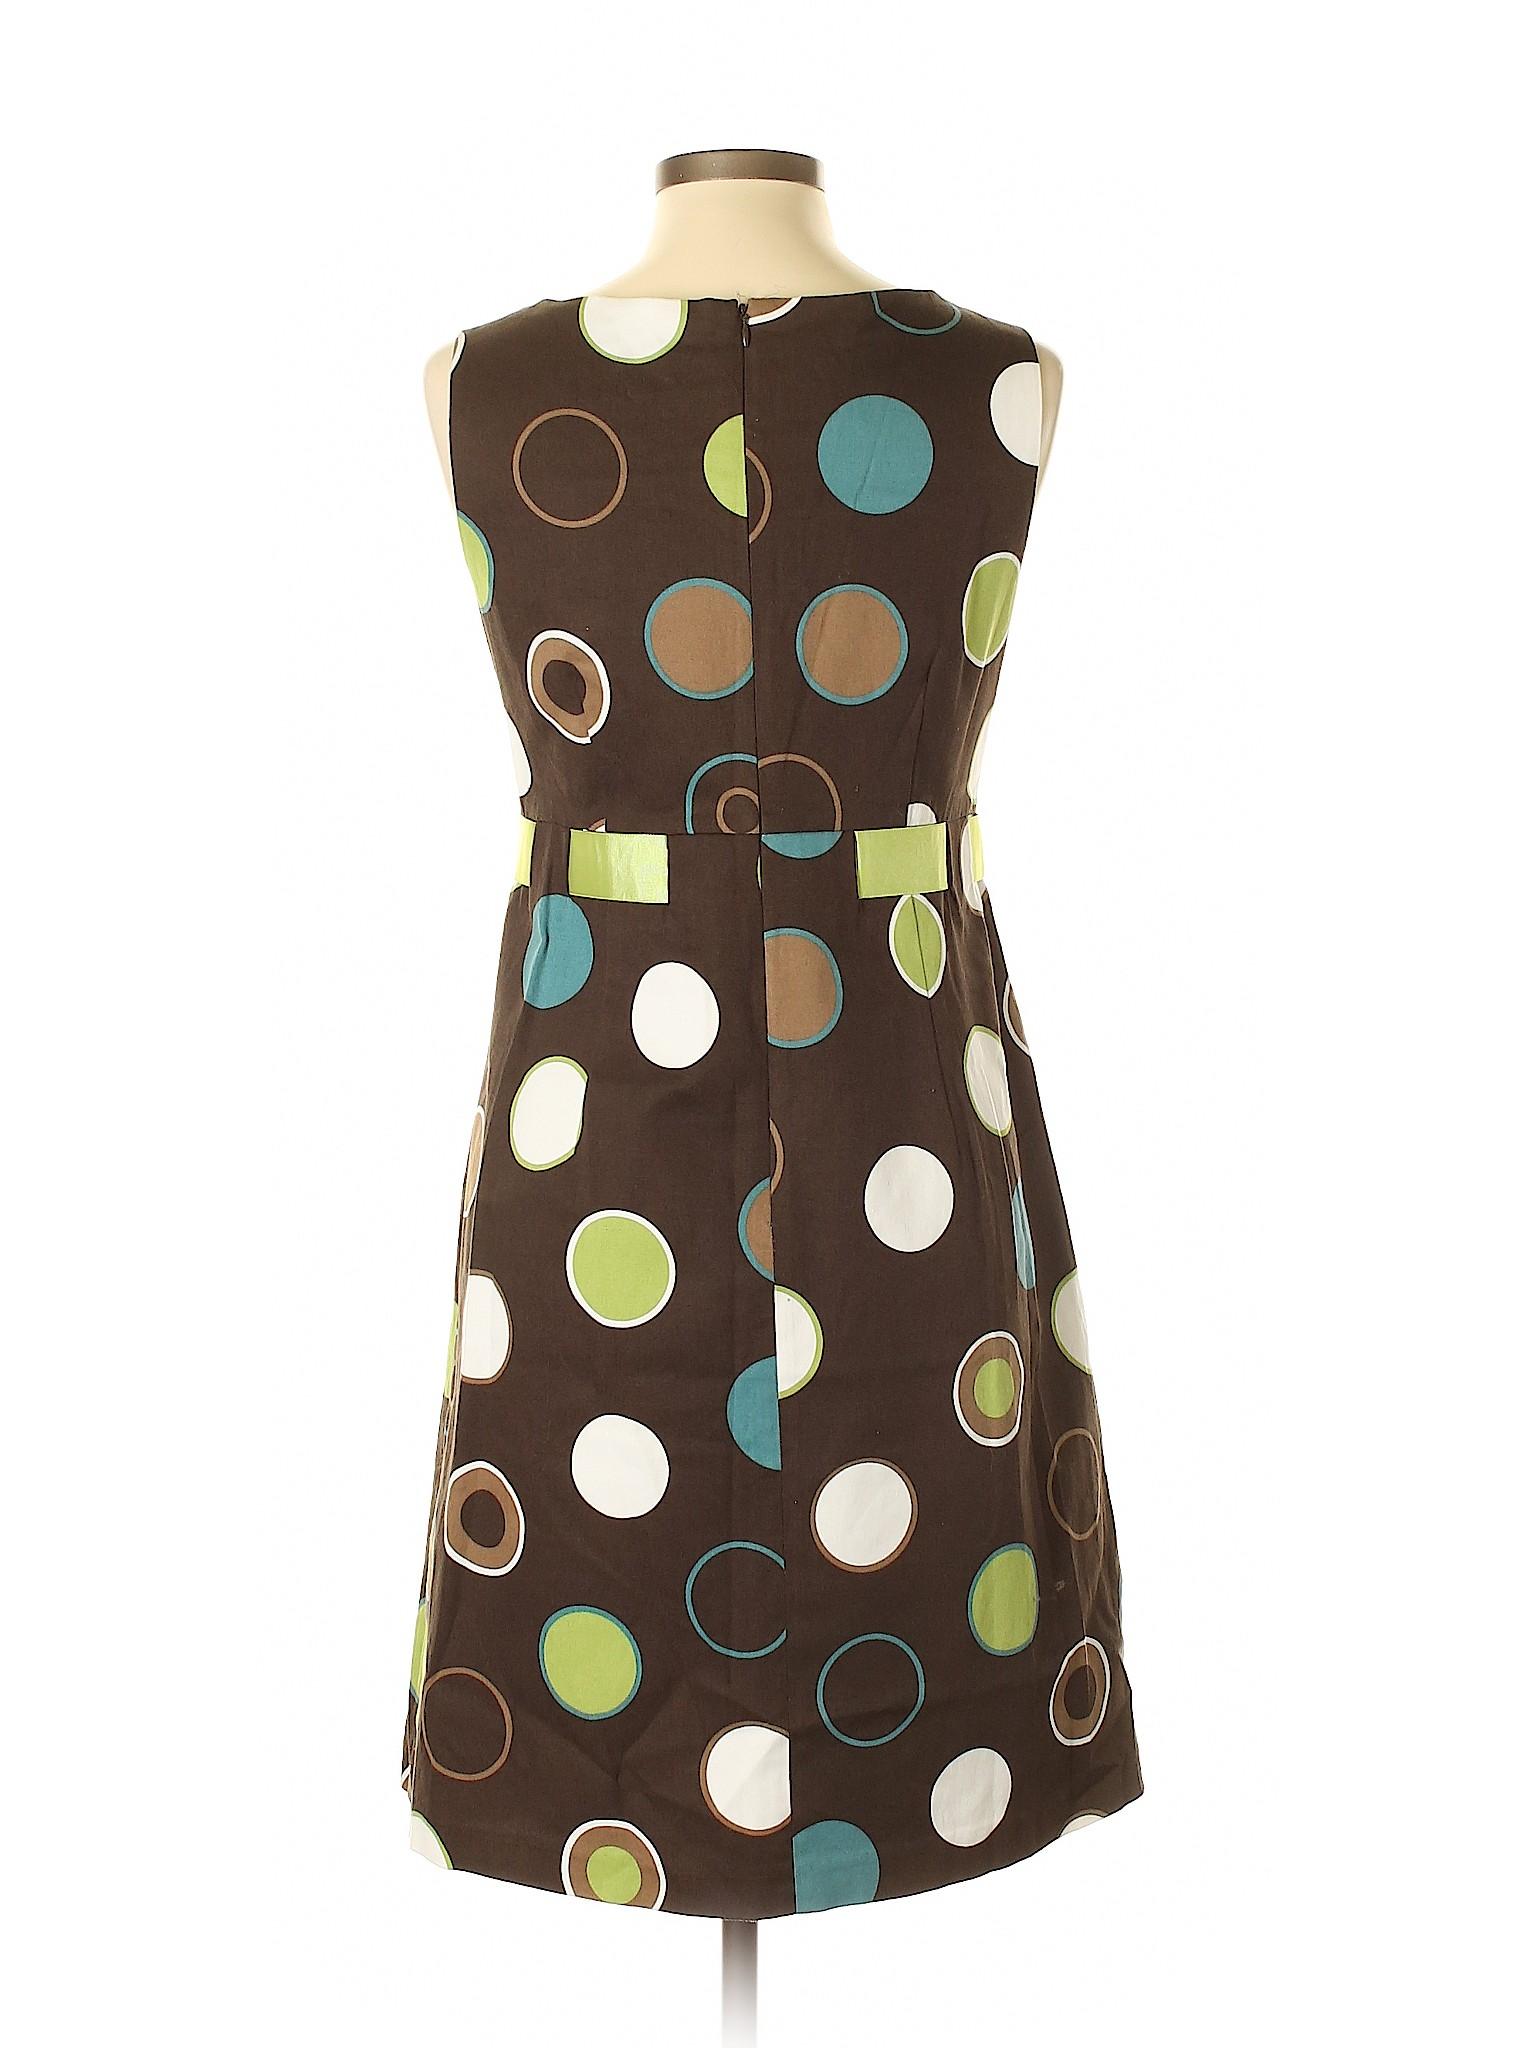 b5bc43394a7b9 Jessica Howard Polka Dots Brown Casual Dress Size 14 - 66% off | thredUP